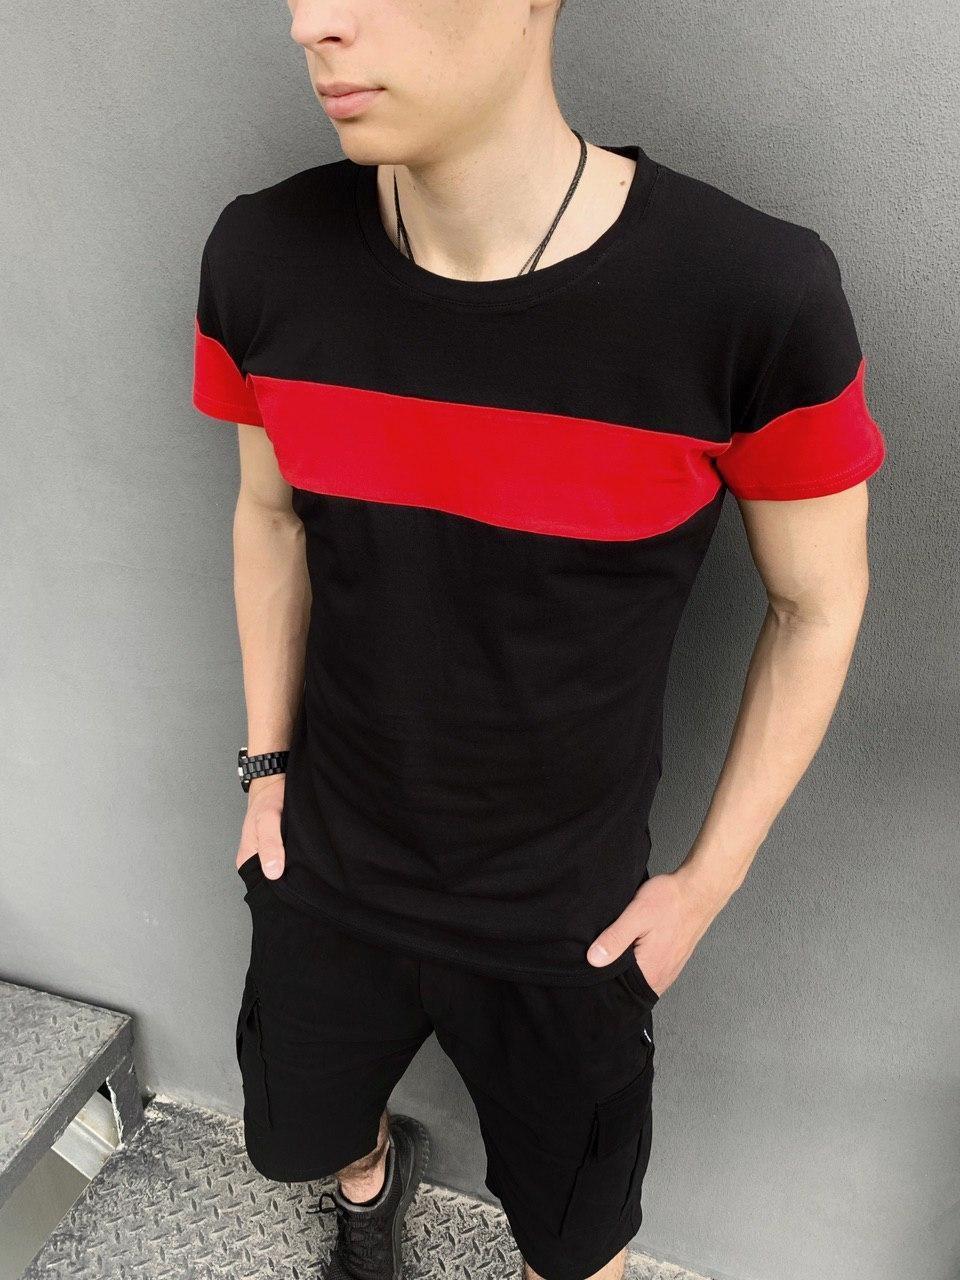 Чоловіча червоно чорна футболка повсякденна